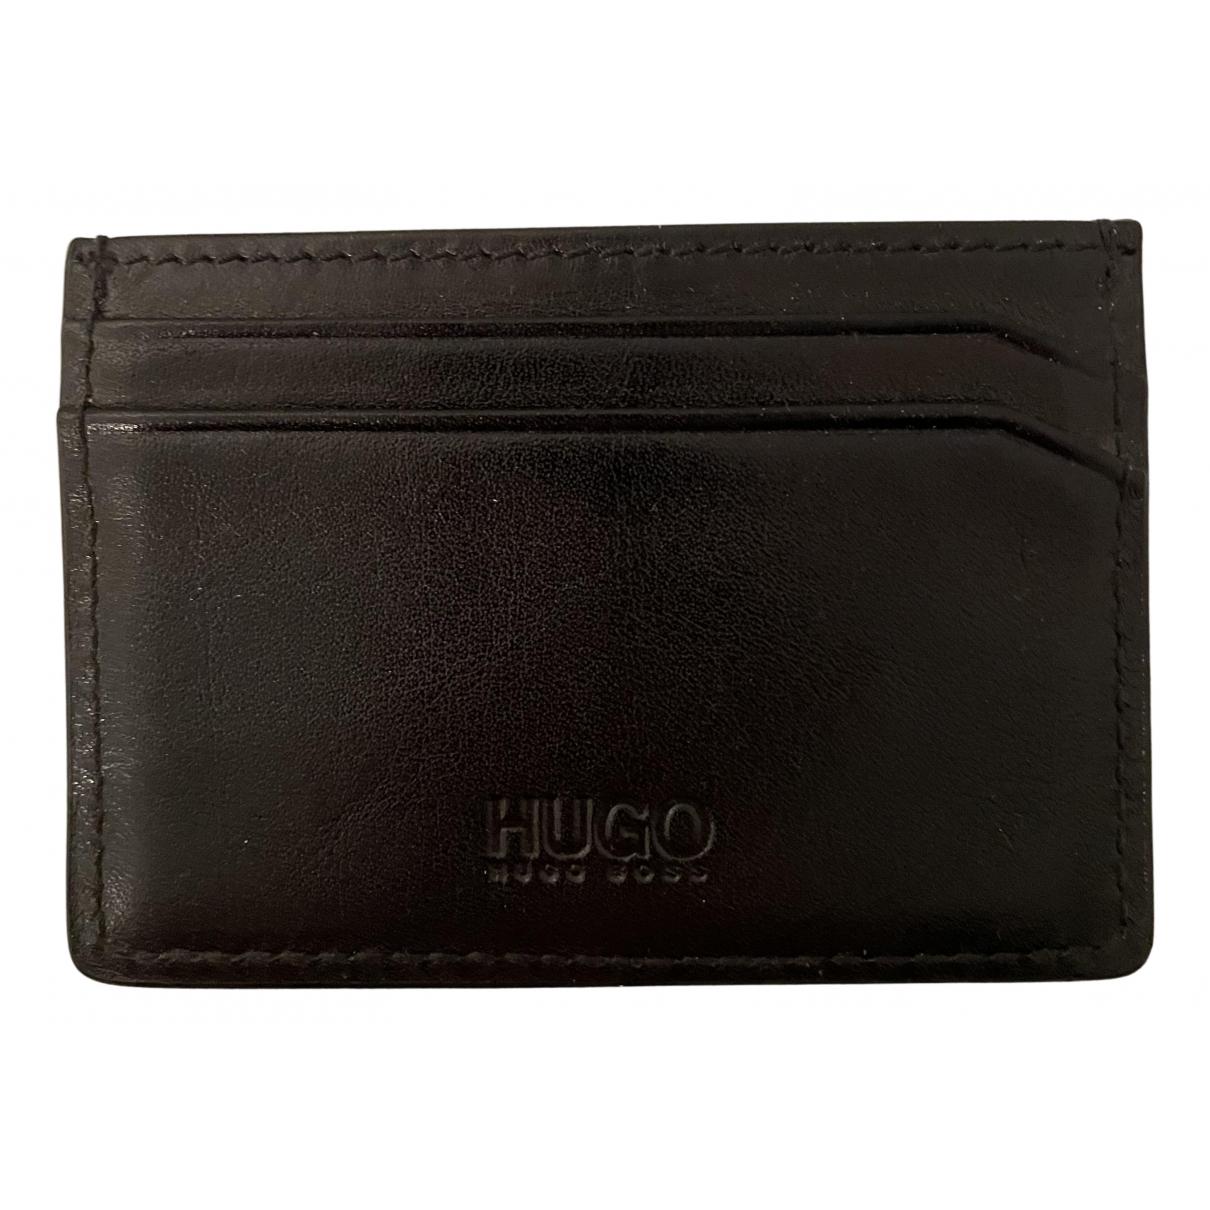 Hugo Boss \N Kleinlederwaren in  Schwarz Leder